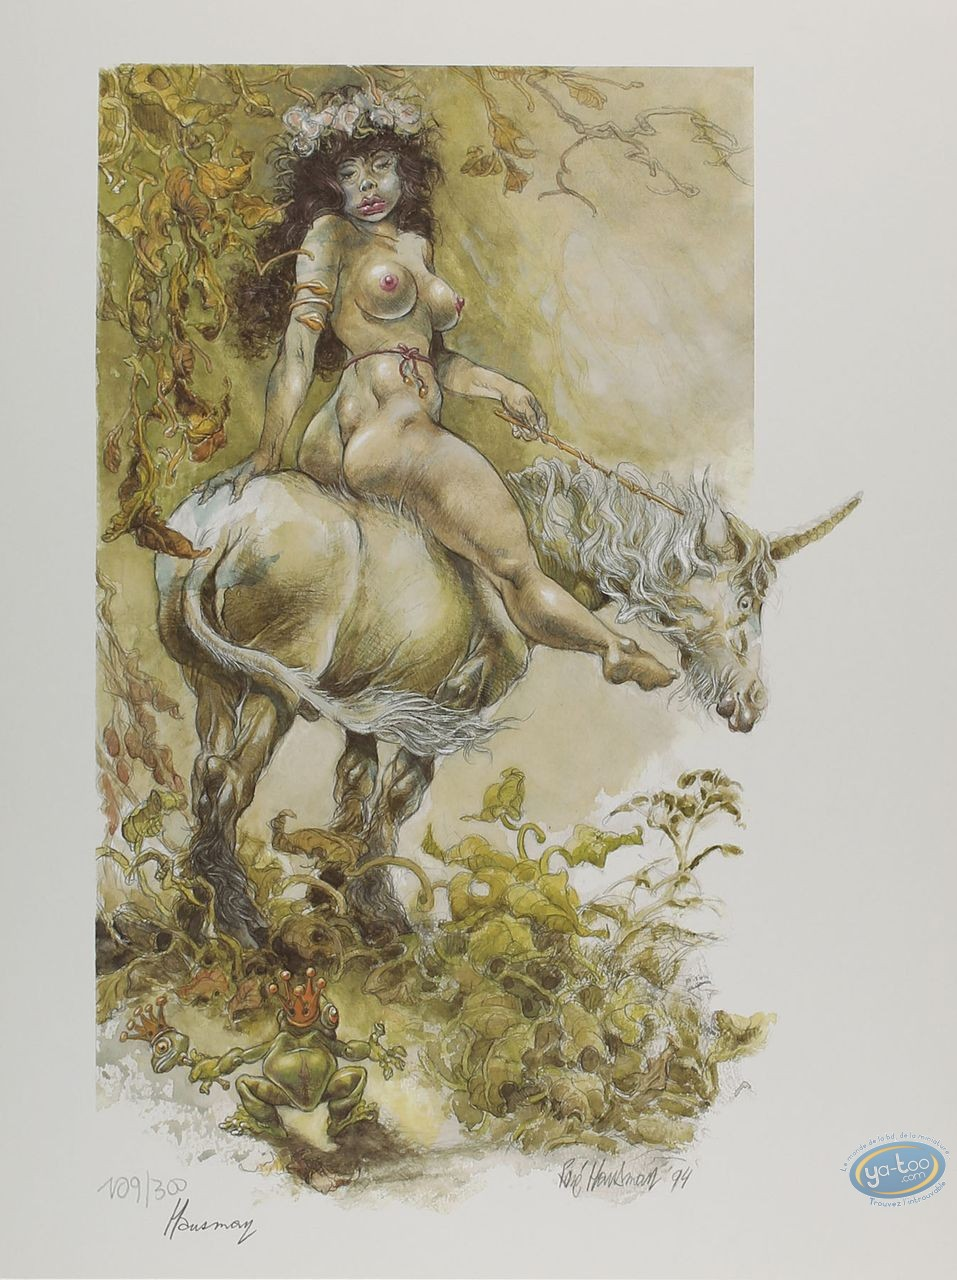 Affiche Offset, Femme sur Licorne